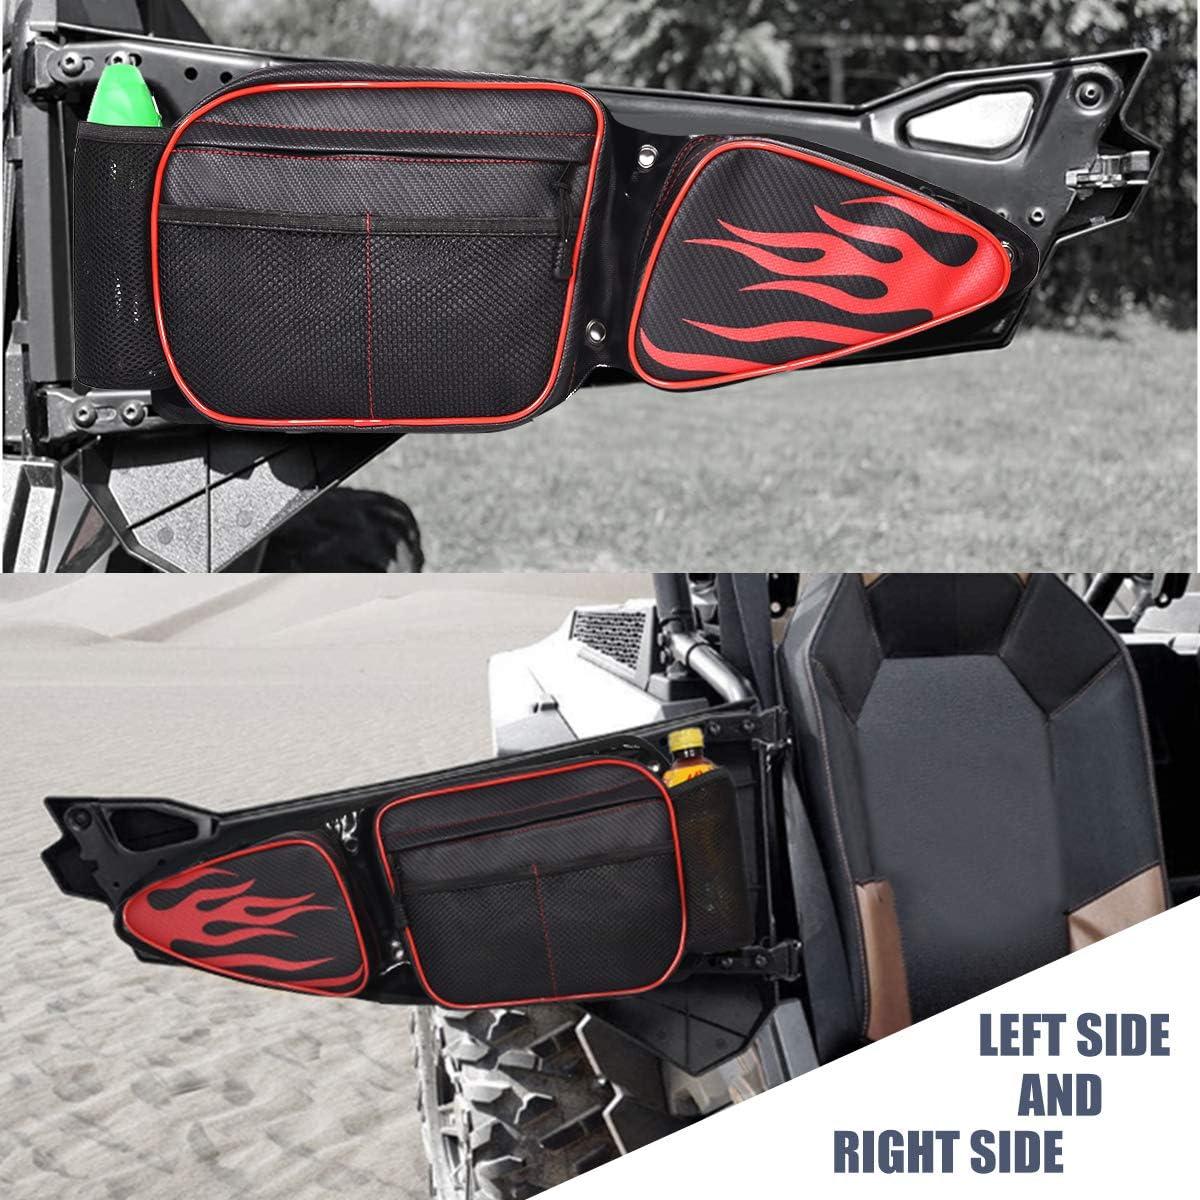 RZR Side Door Bags,UTV Front Door Side Storage Bag Set with Knee Pad for 2014 2015 2016 2017 2018 2019 2020 Polaris RZR XP Turbo Turbo S 1000 S900 RZR XP4 1000